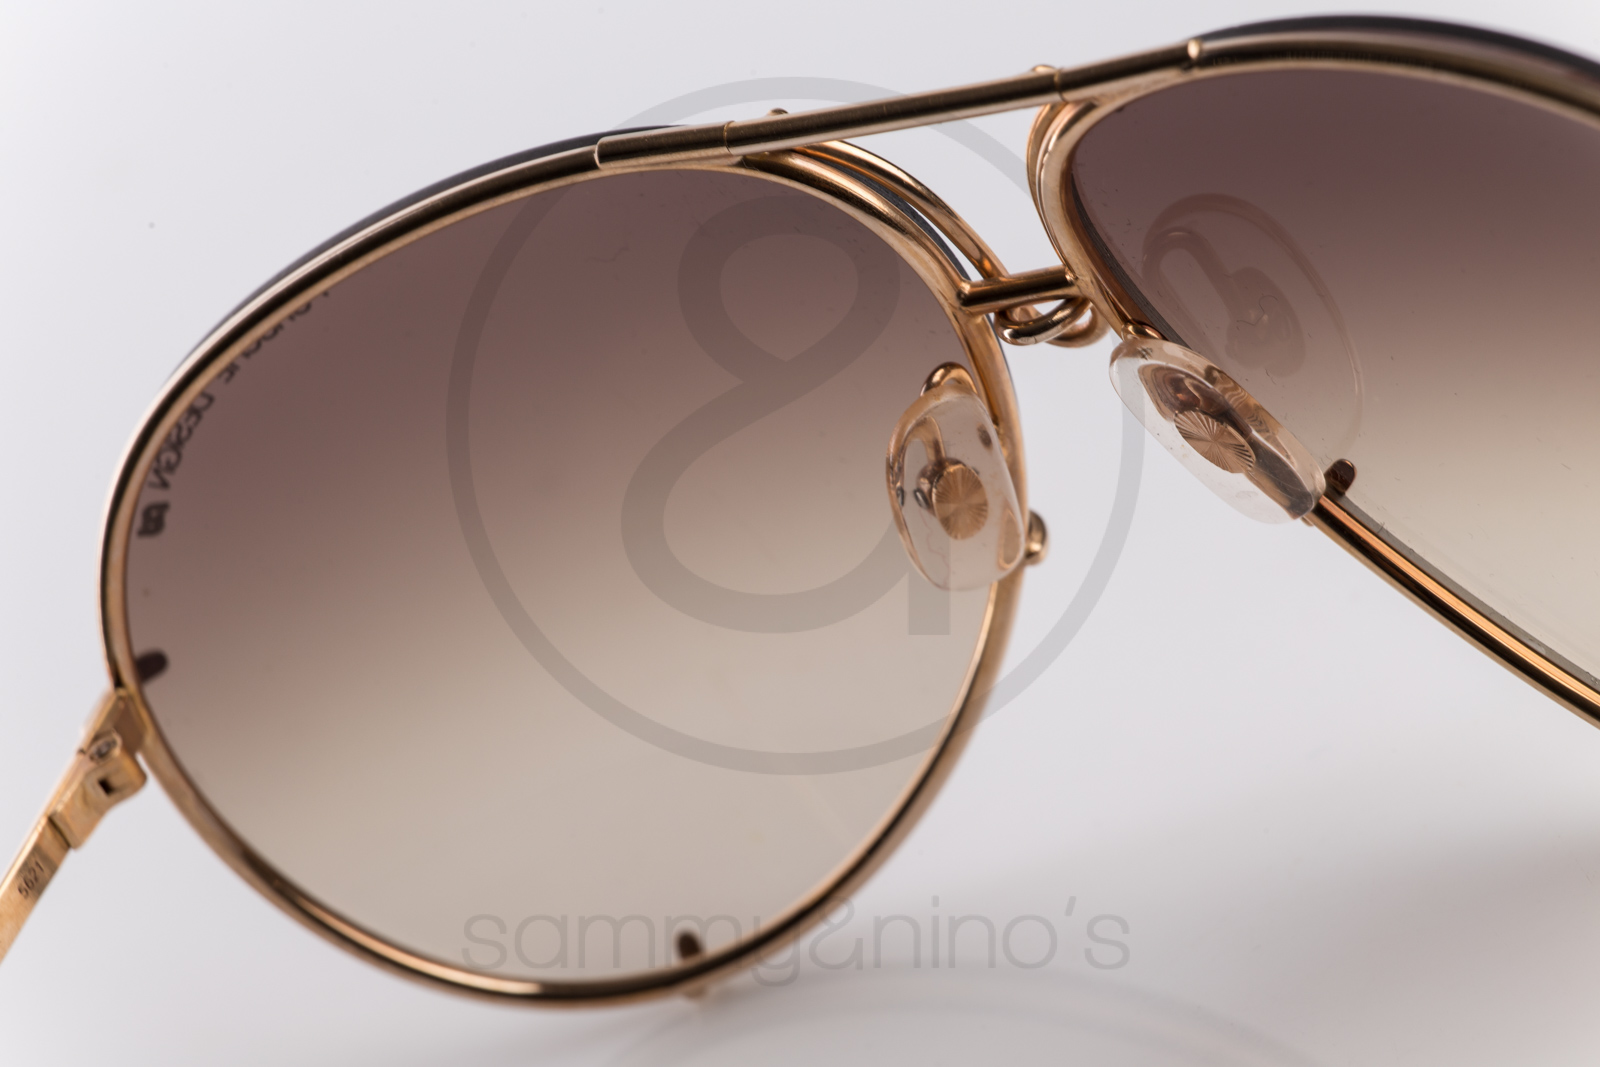 Porsche Carrera Sunglasses  porsche carrera 5621 sammy nino s